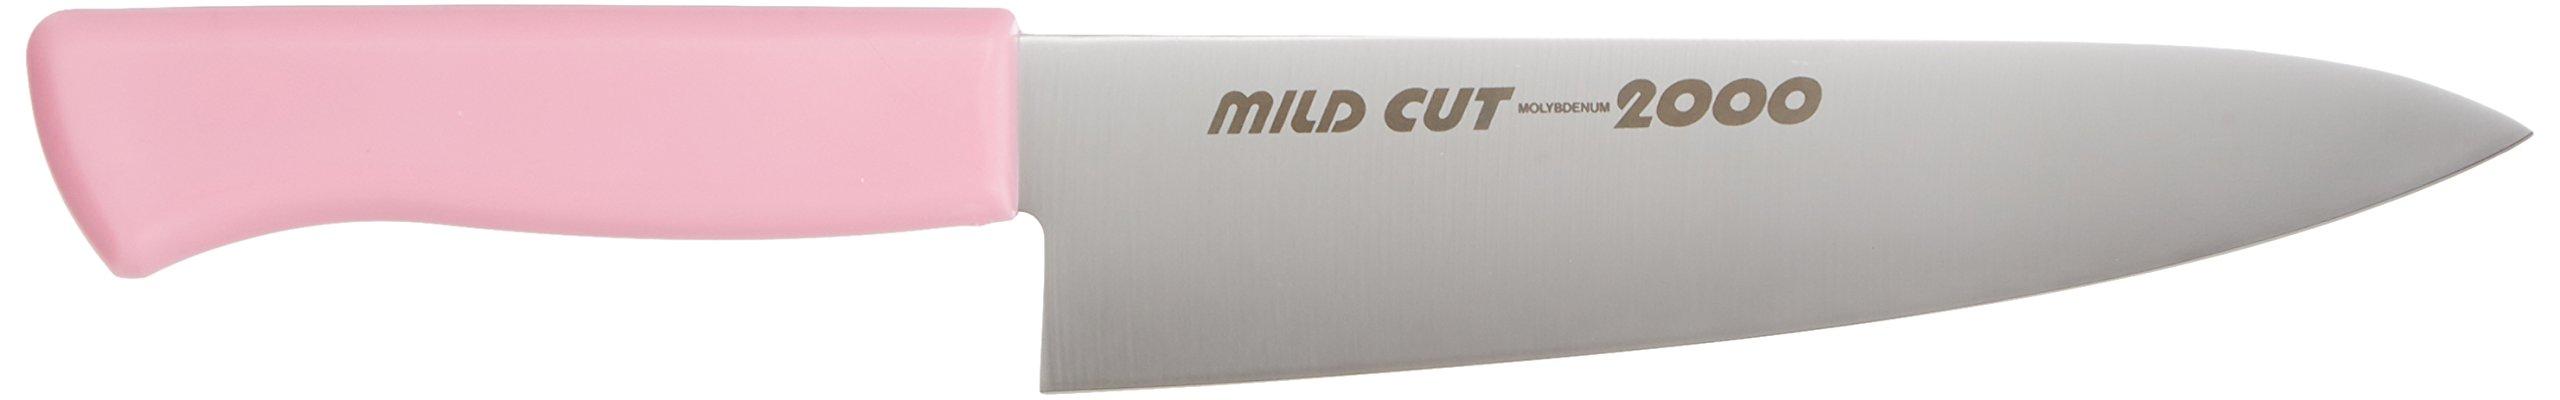 EBM MILD CUT-2000 color knife Gyuto MCG 18cm Pink